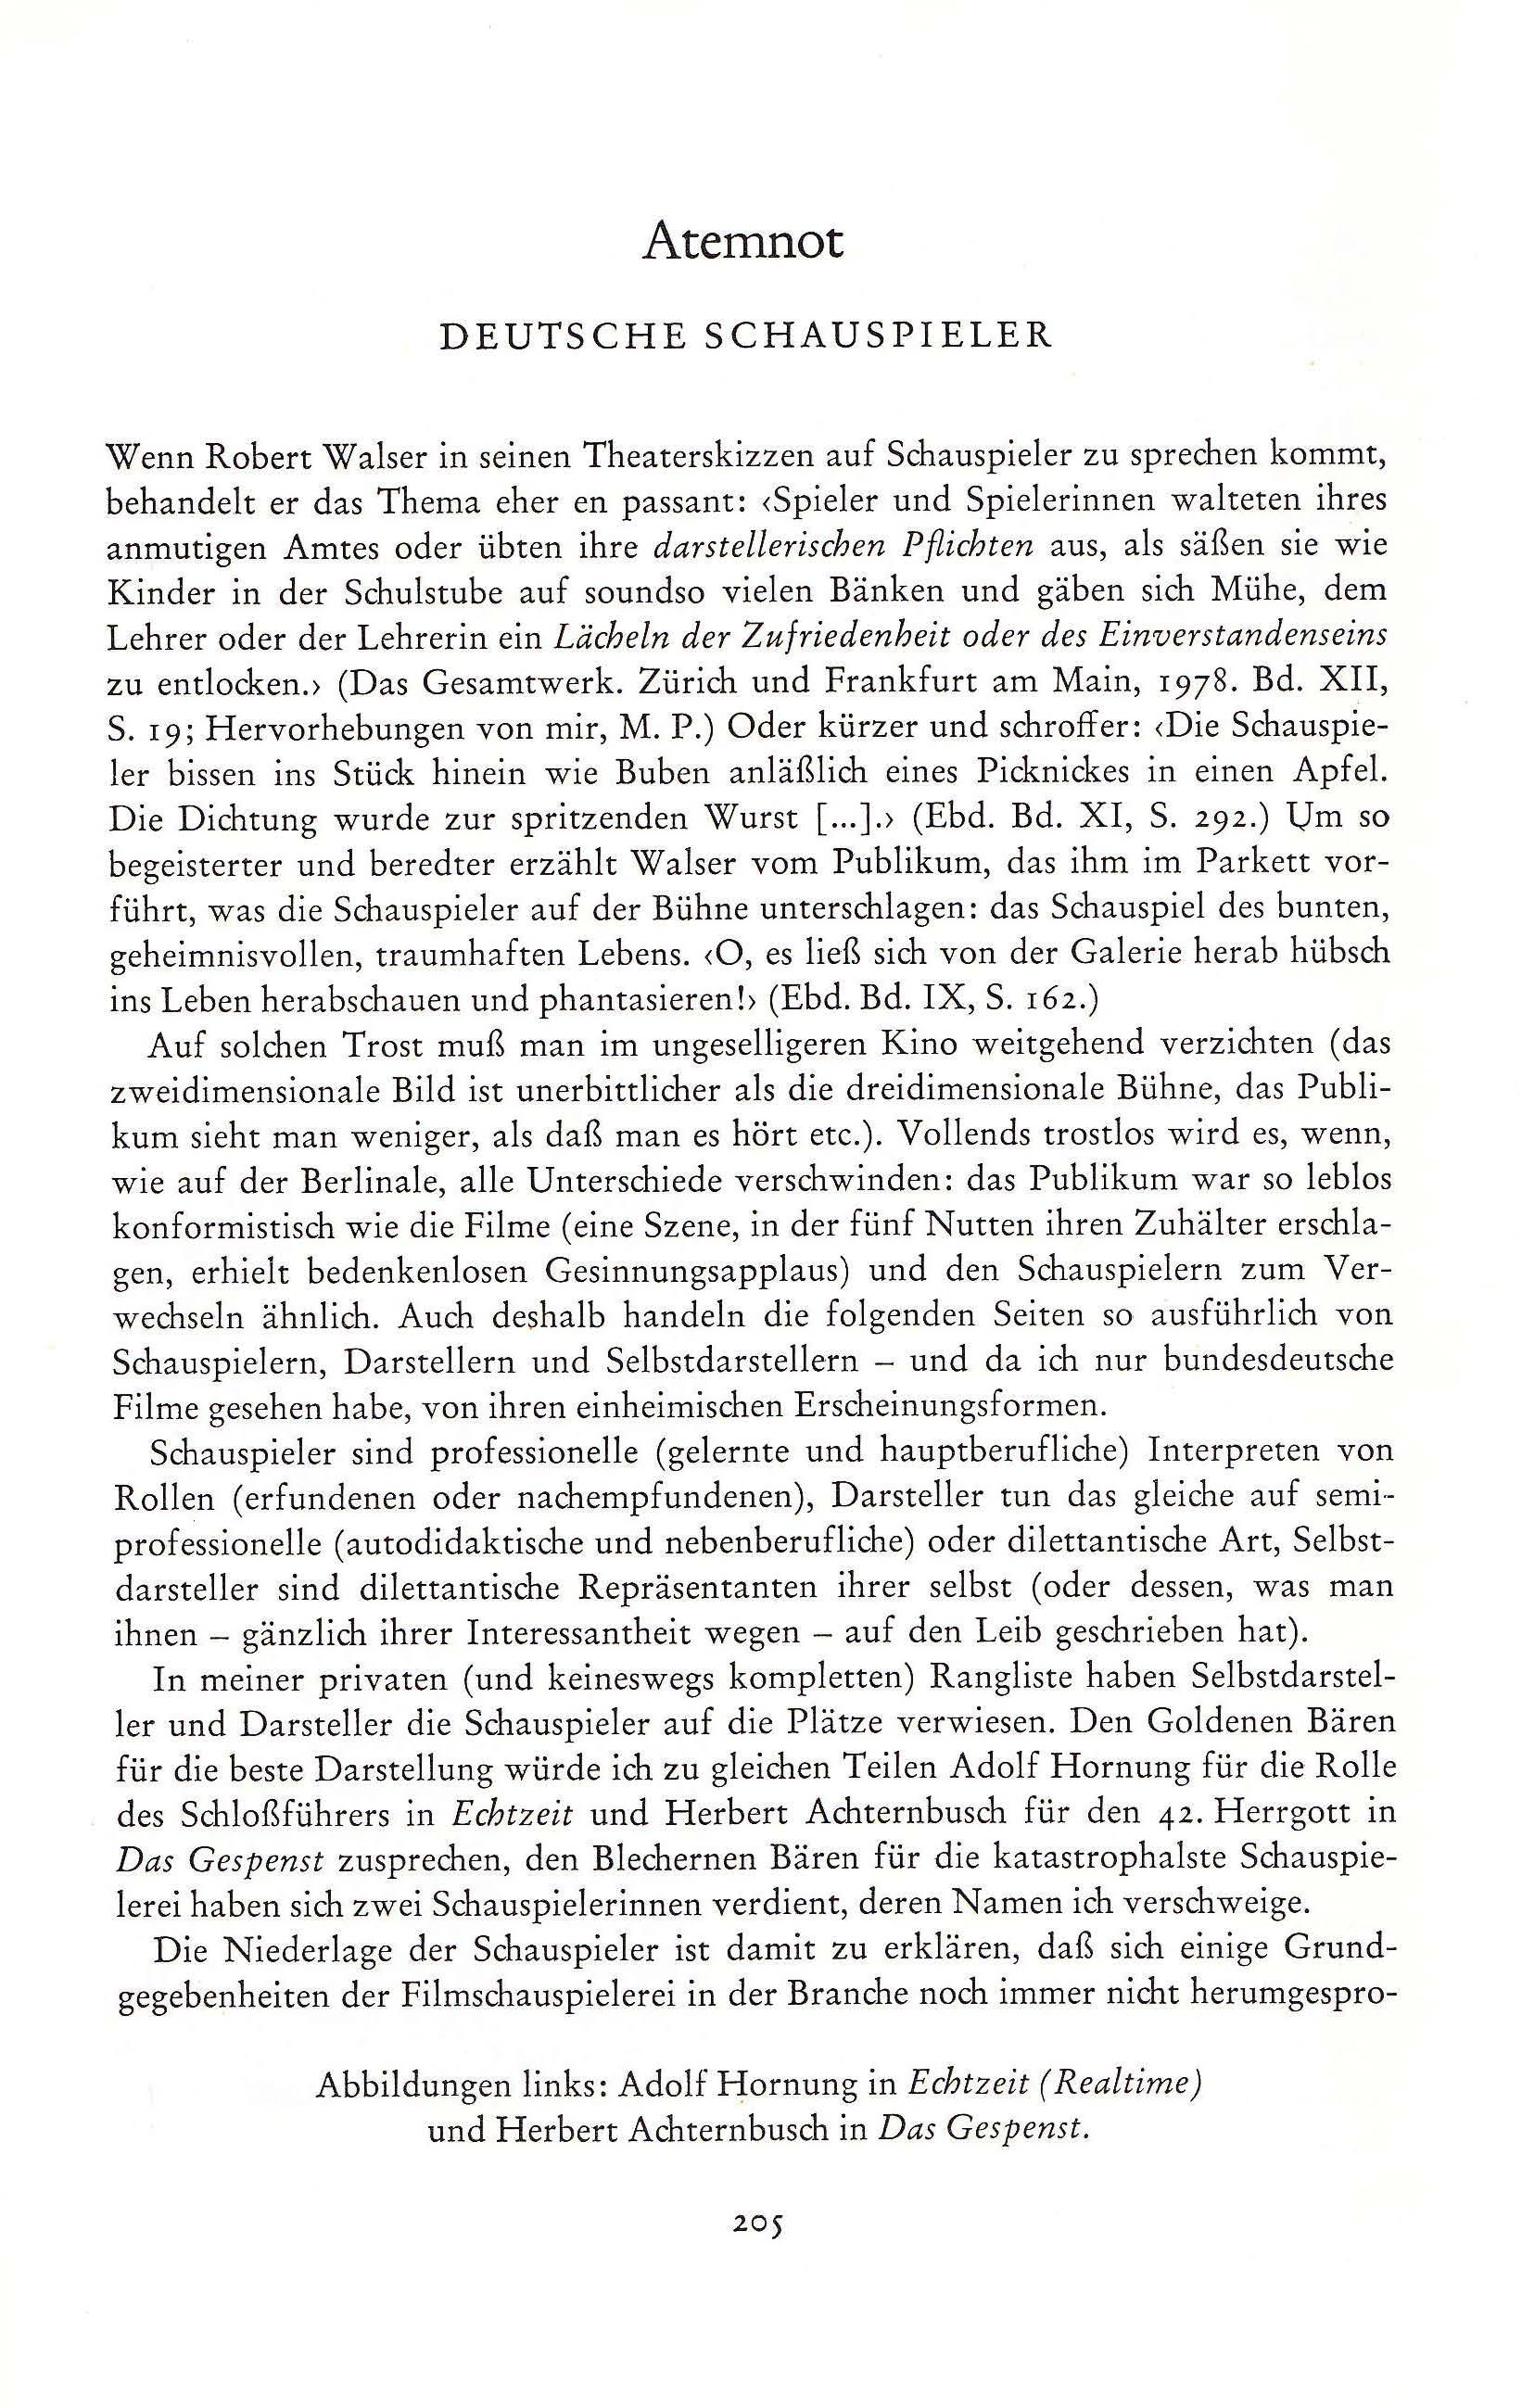 Pehlke: Deutsche Schauspieler